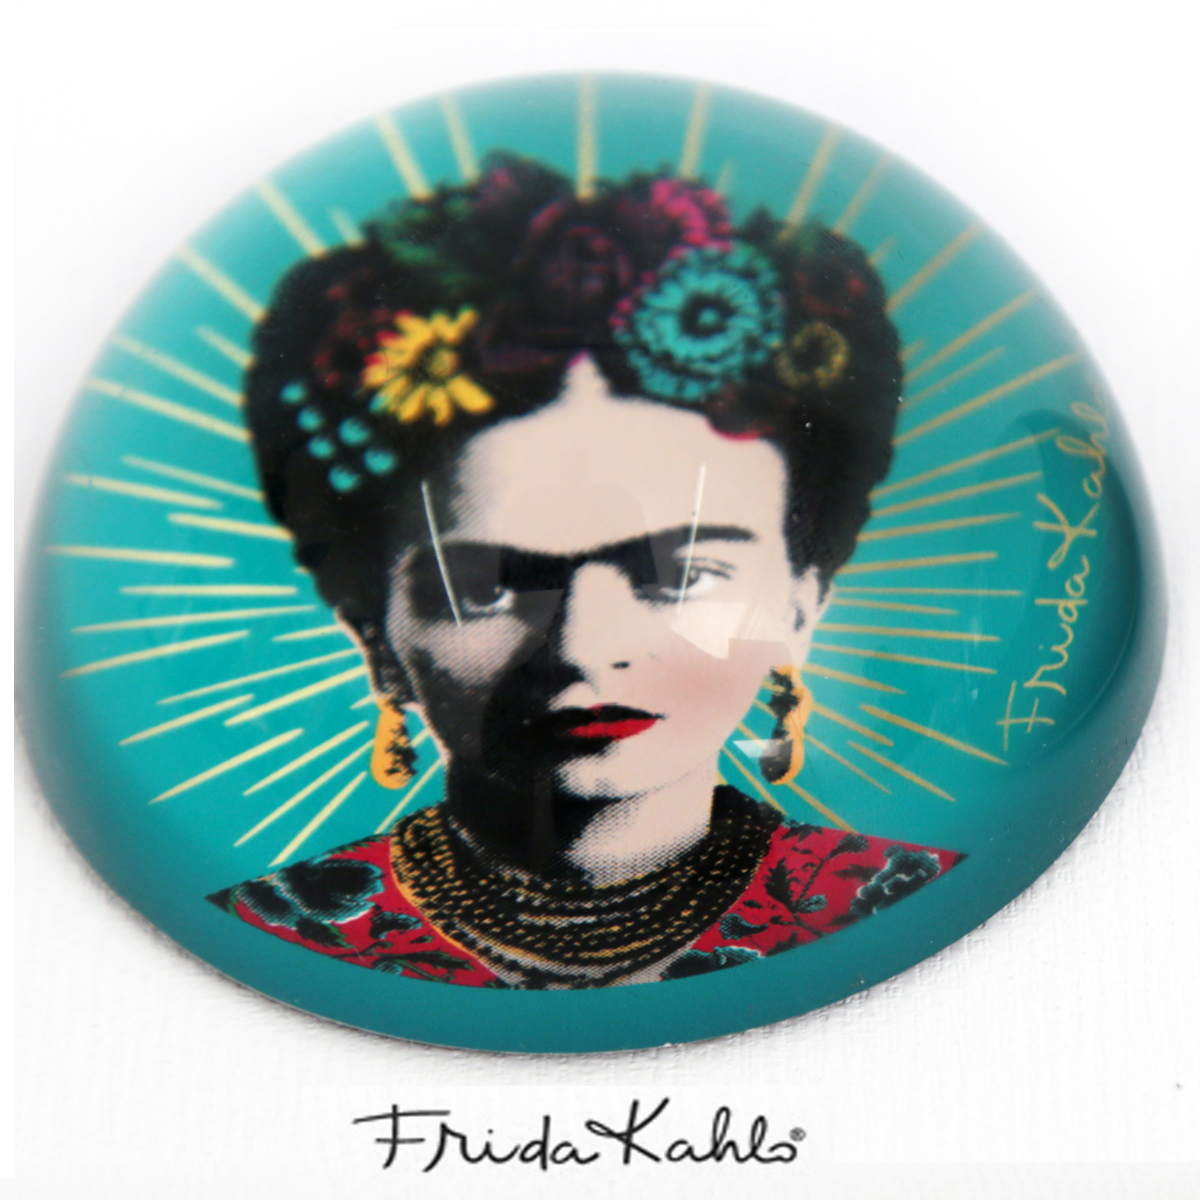 Presse papier verre \'Frida Kahlo\' turquoise - 78x40 mm - [Q9962]